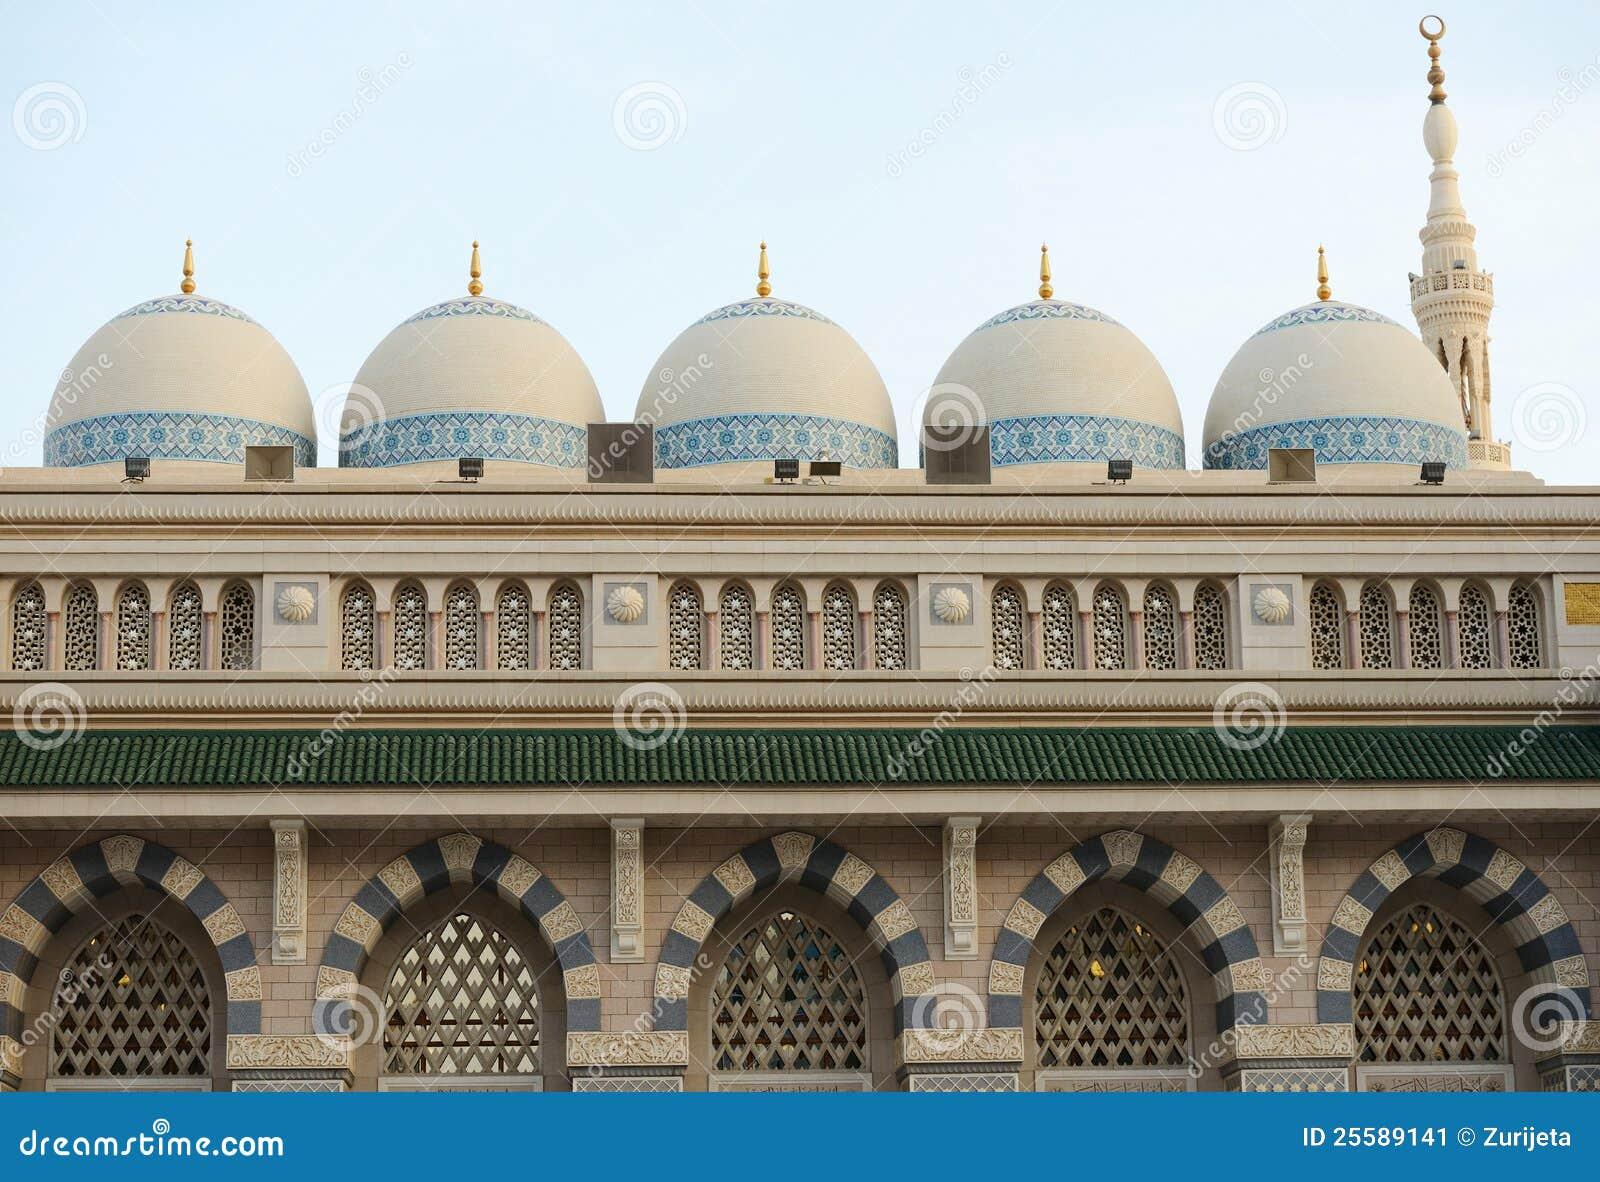 Beautiful Wallpaper High Resolution Madina - al-madina-mosque-25589141  Photograph_732110.jpg